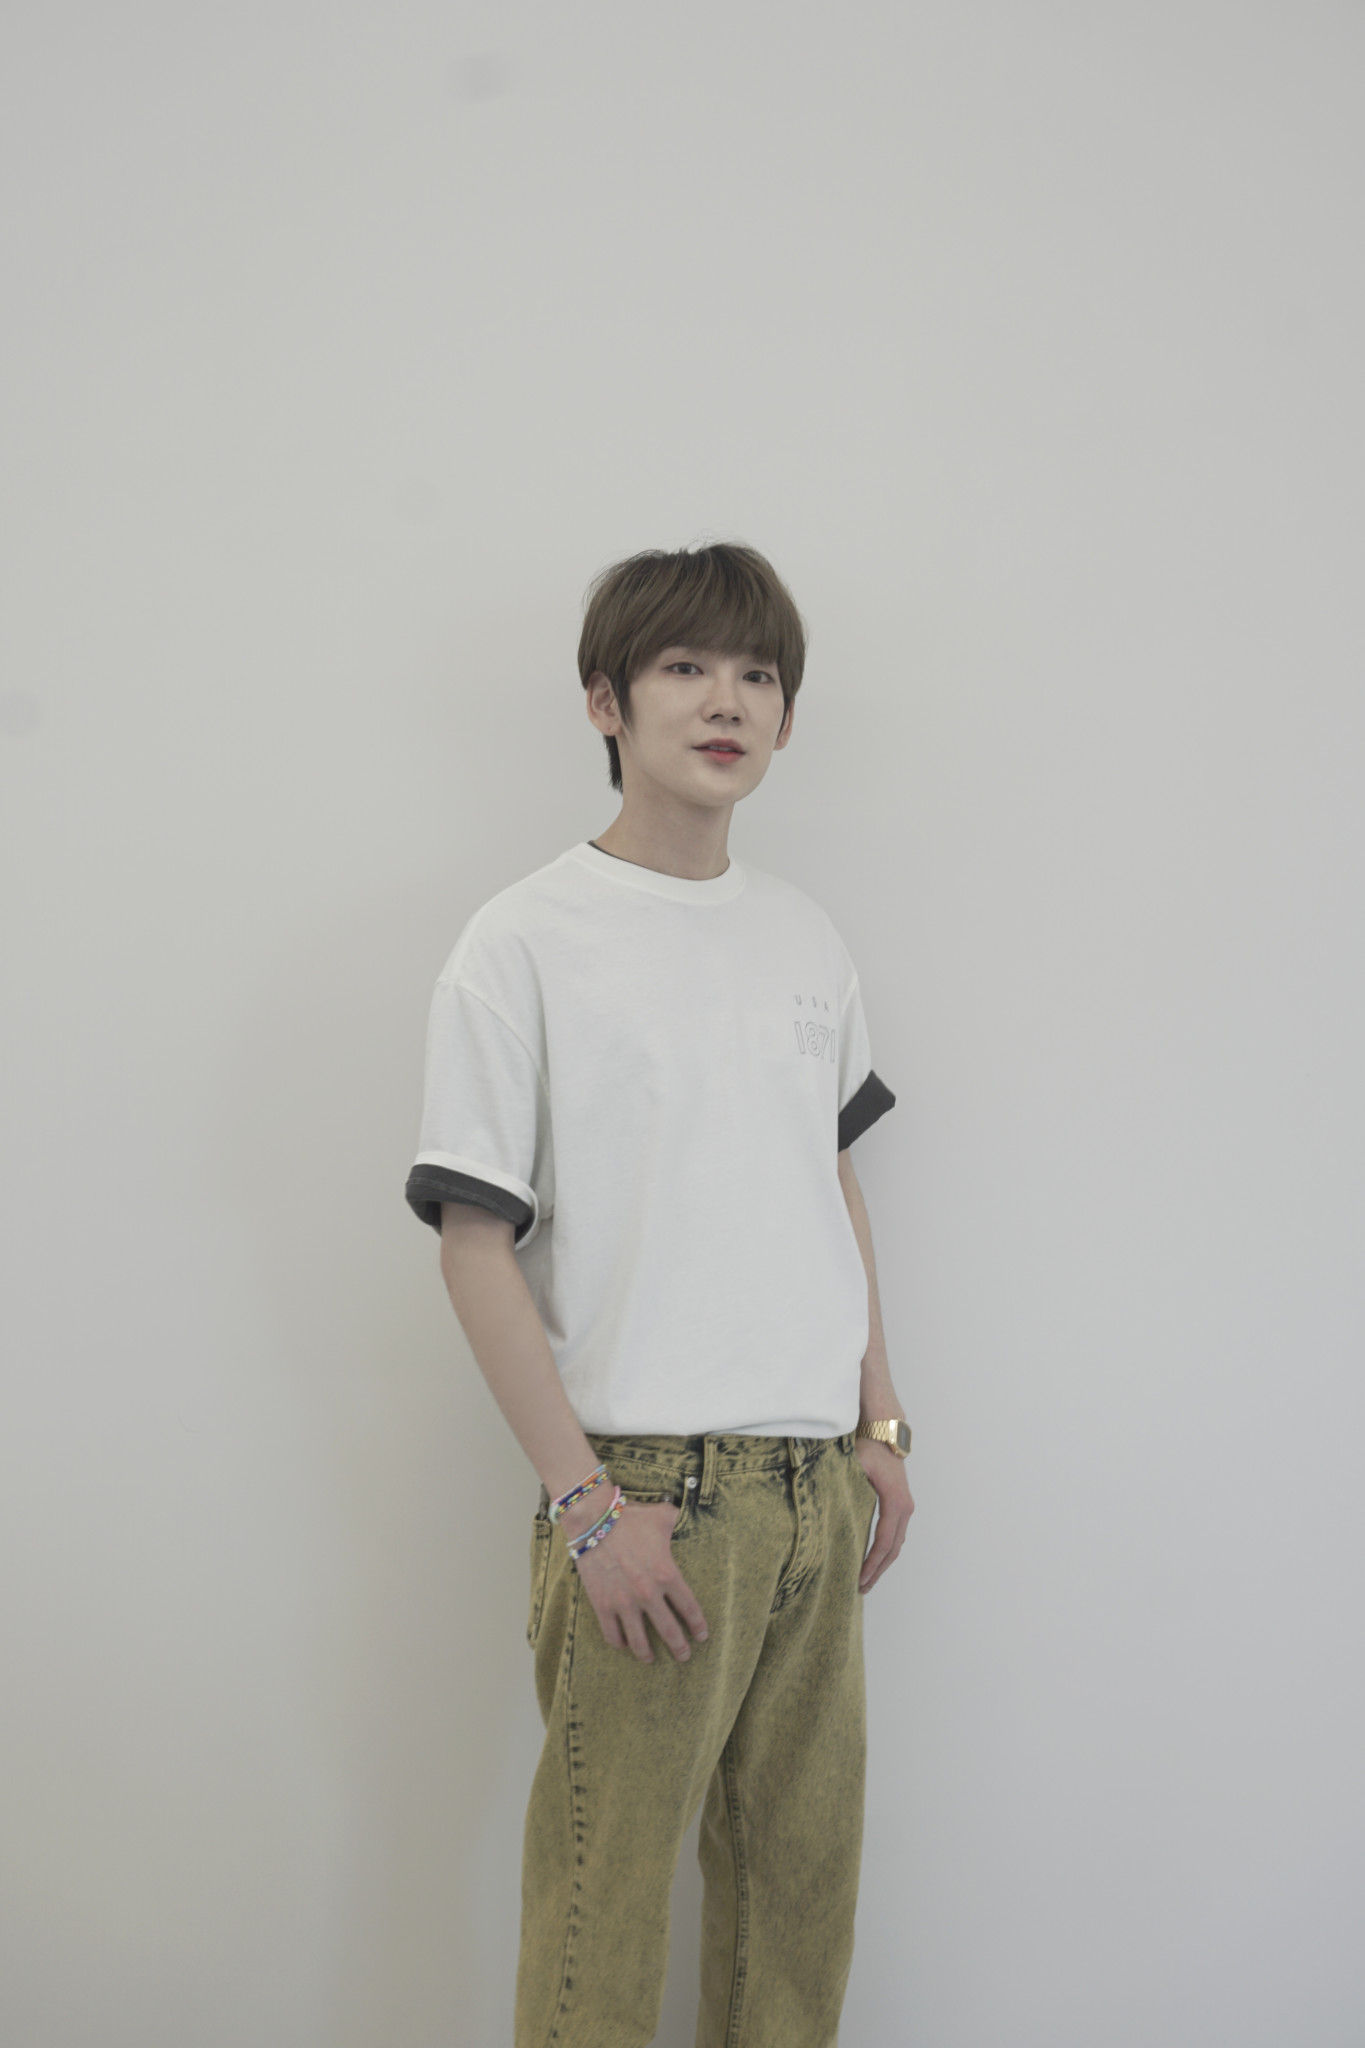 KENTA 髙田健太 JBJ95 K-POP 韓国 韓流